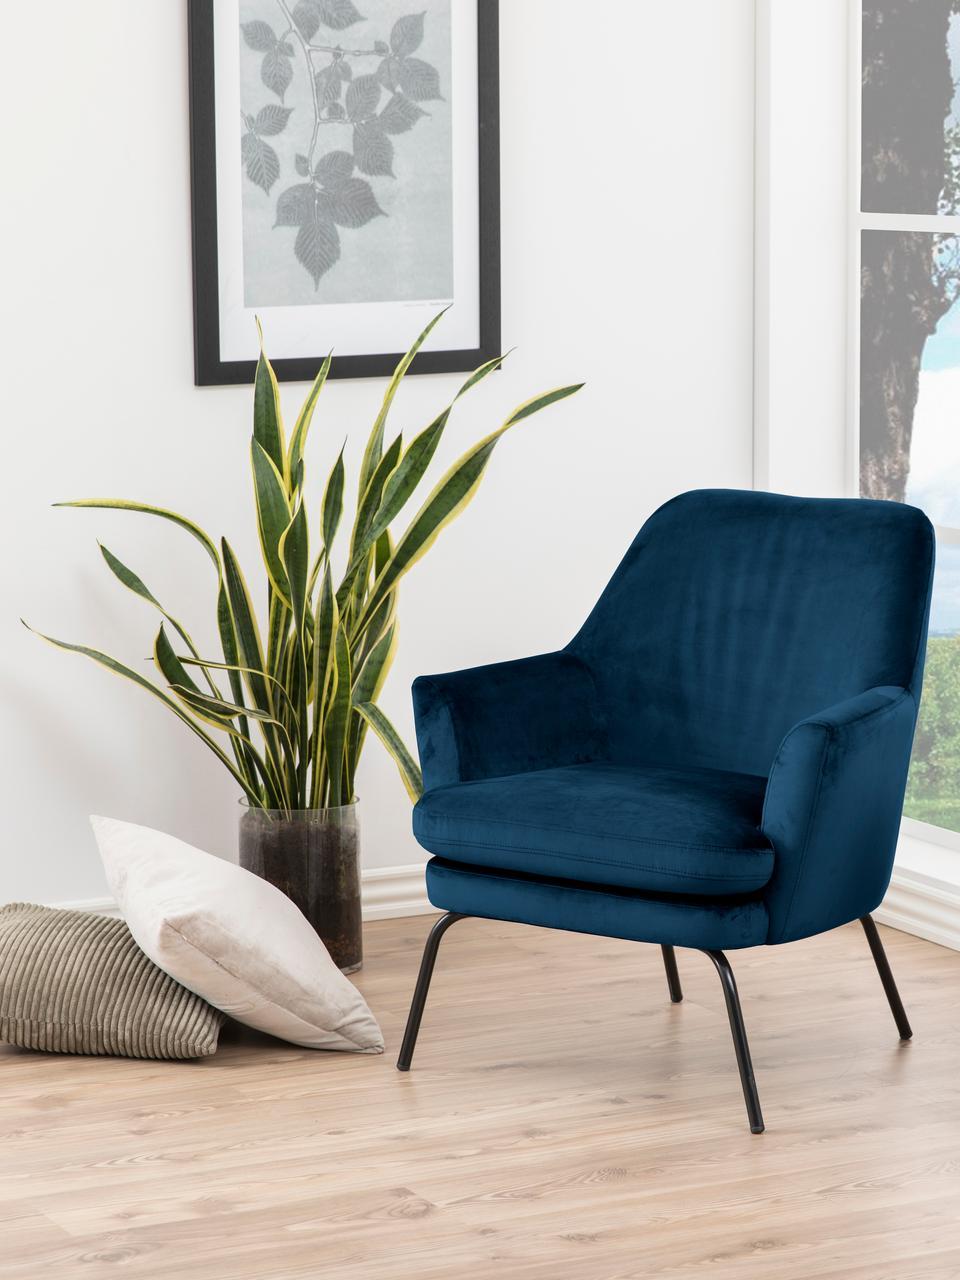 Fauteuil lounge en velours bleu Chisa, Velours bleu marine